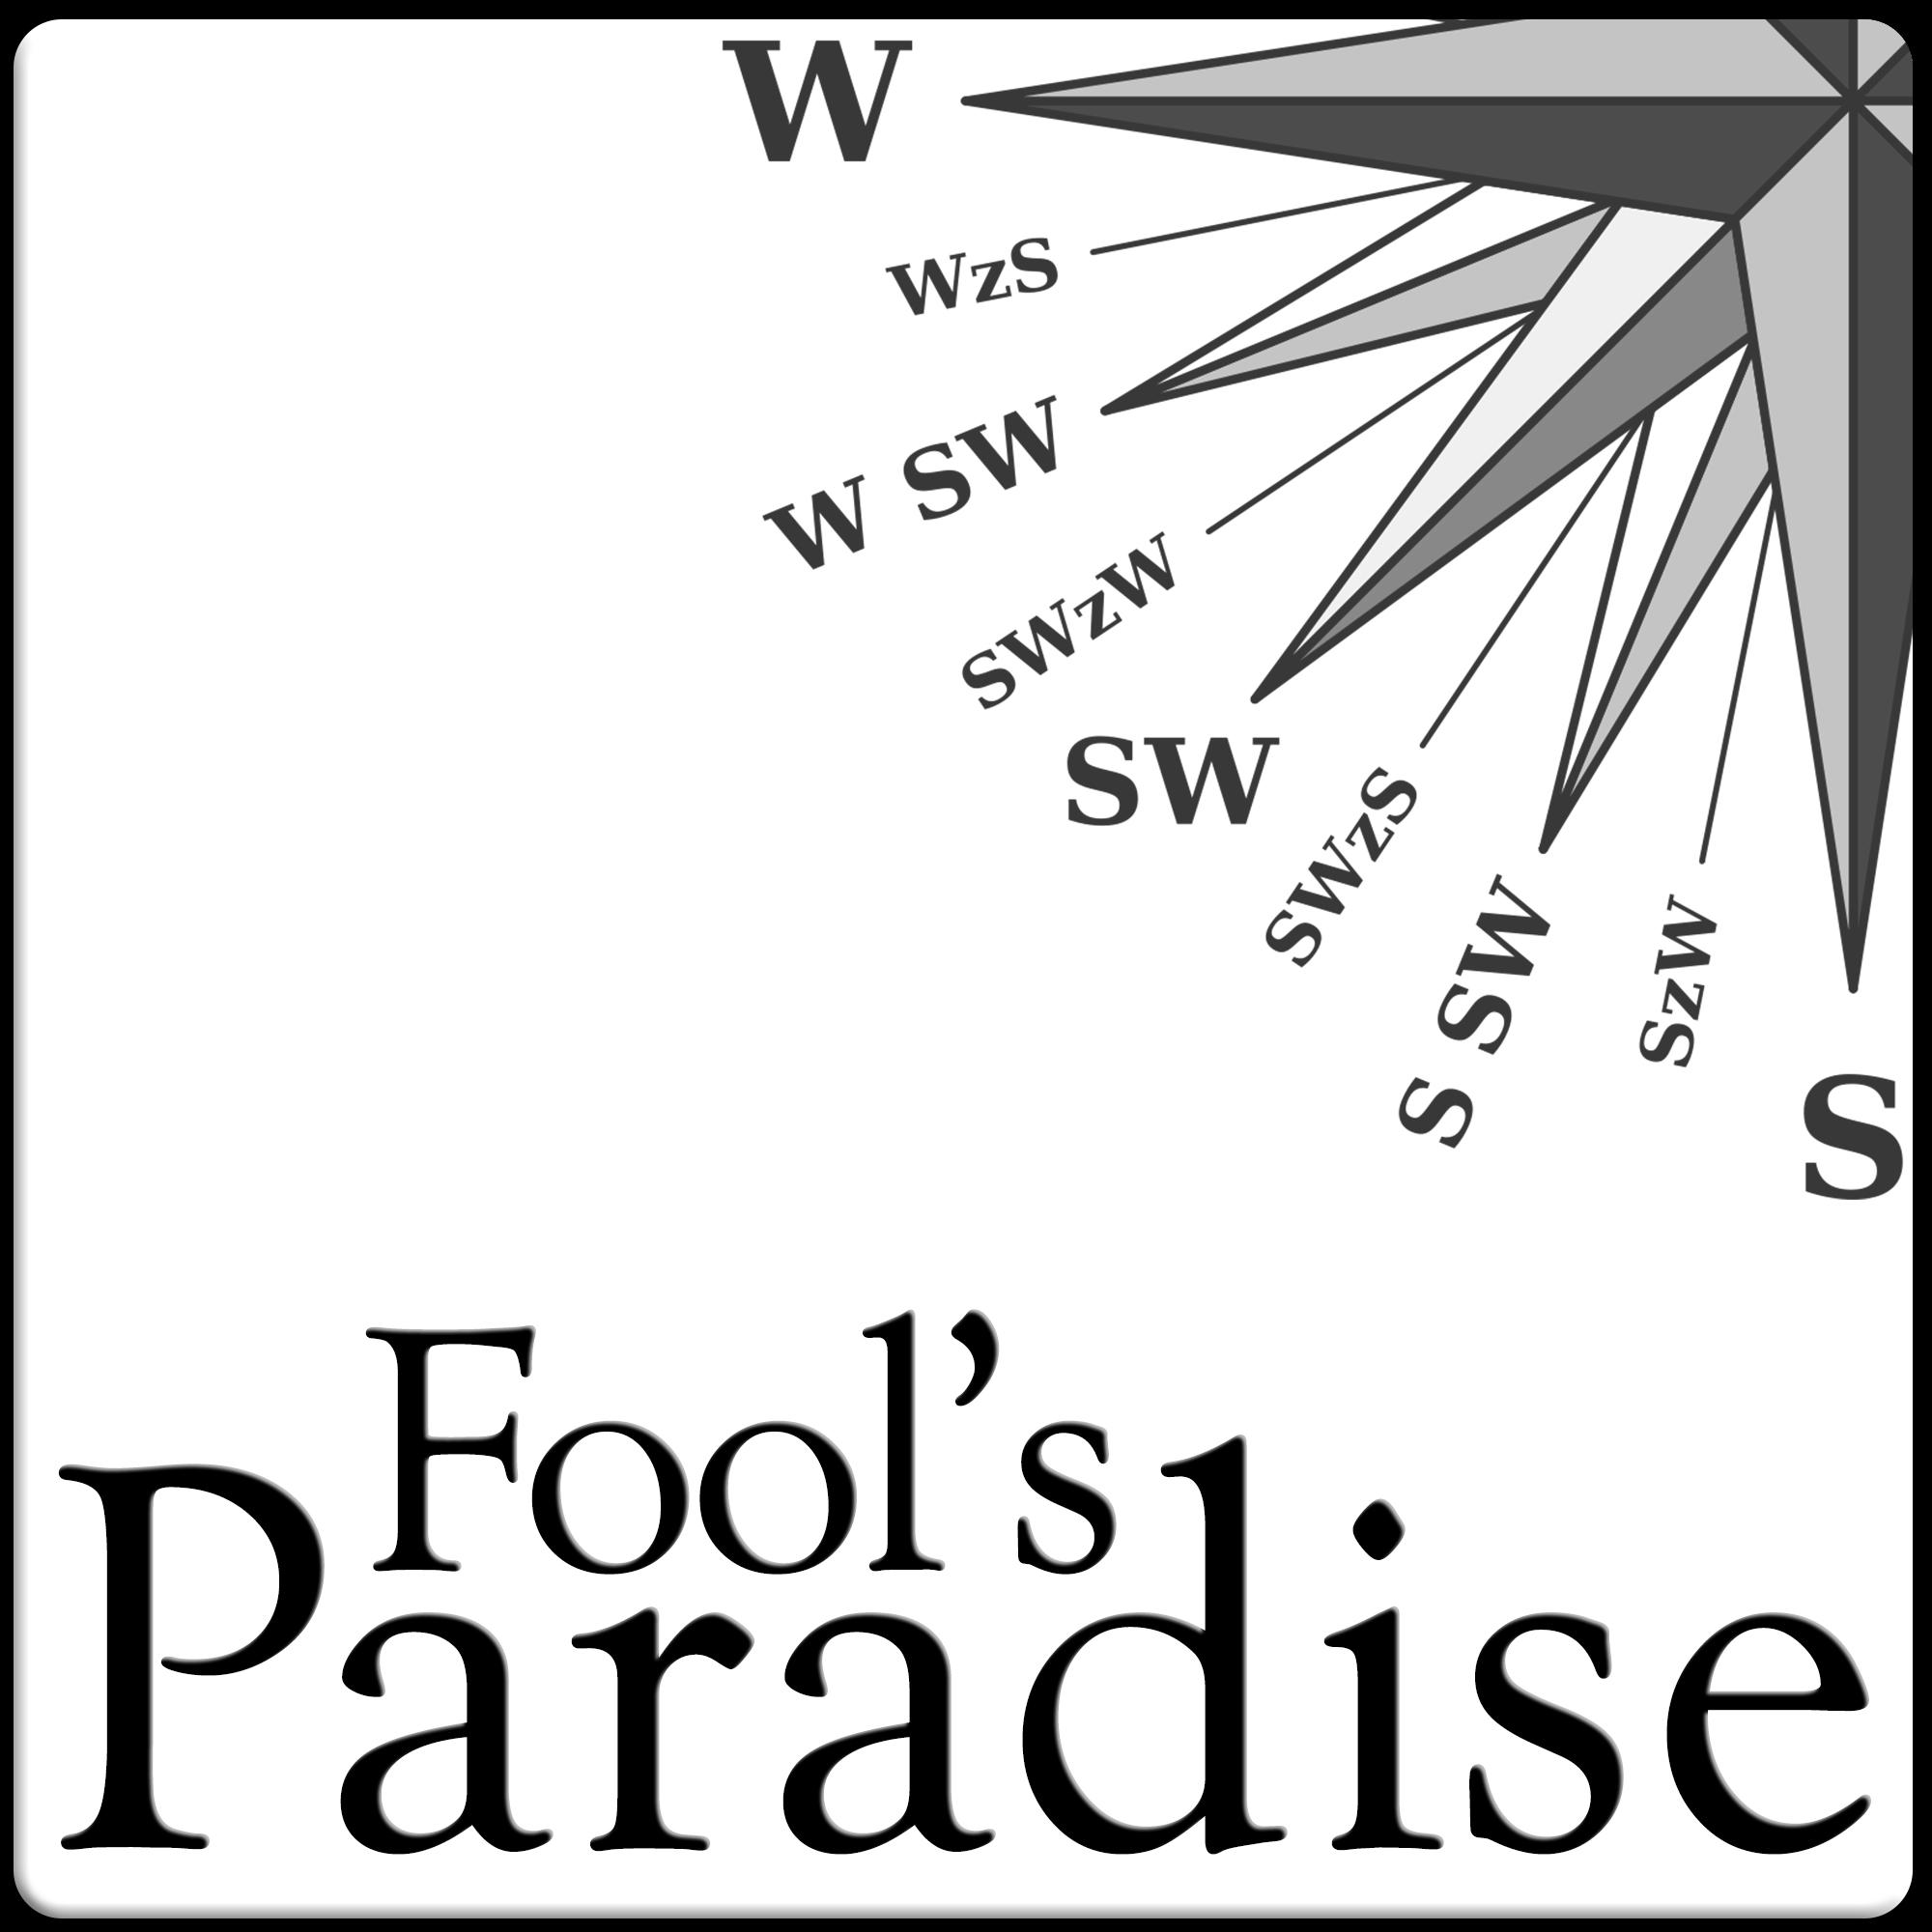 fool s paradise listen via stitcher radio on demand Emerson Company get the stitcher app